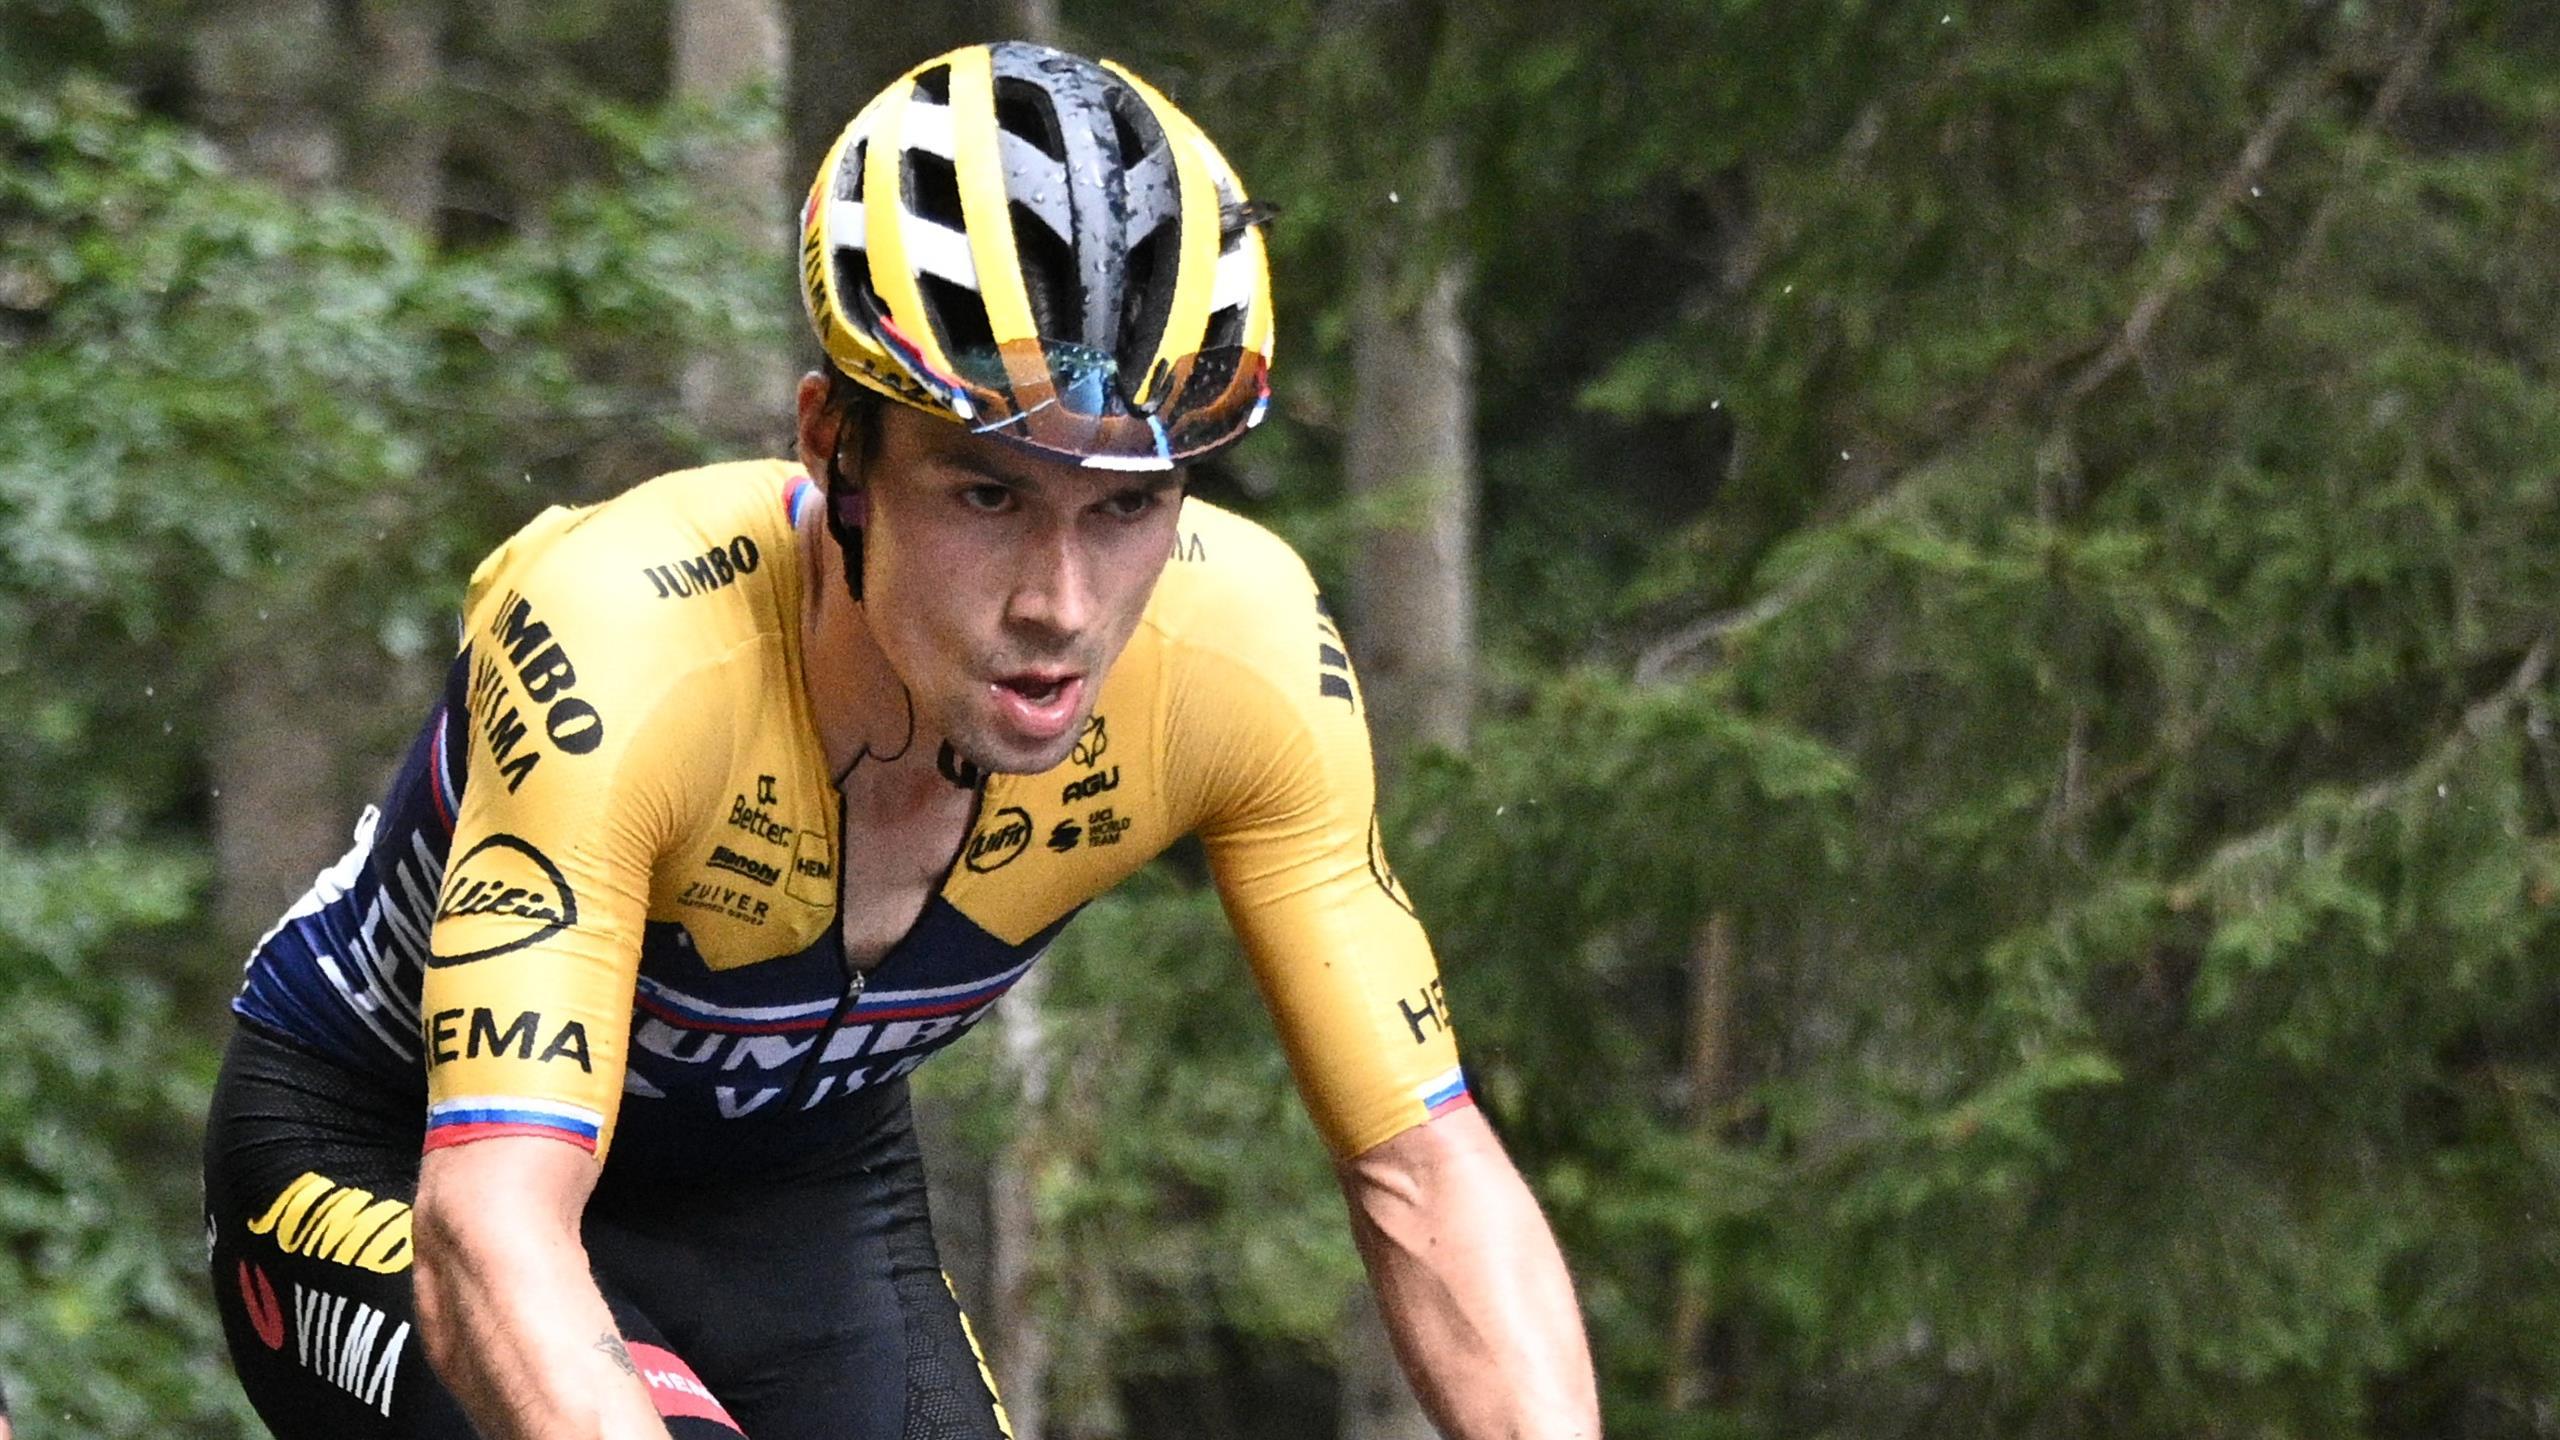 Tour De France 2020 Primoz Roglic Doubts Over Injury Issue Eurosport